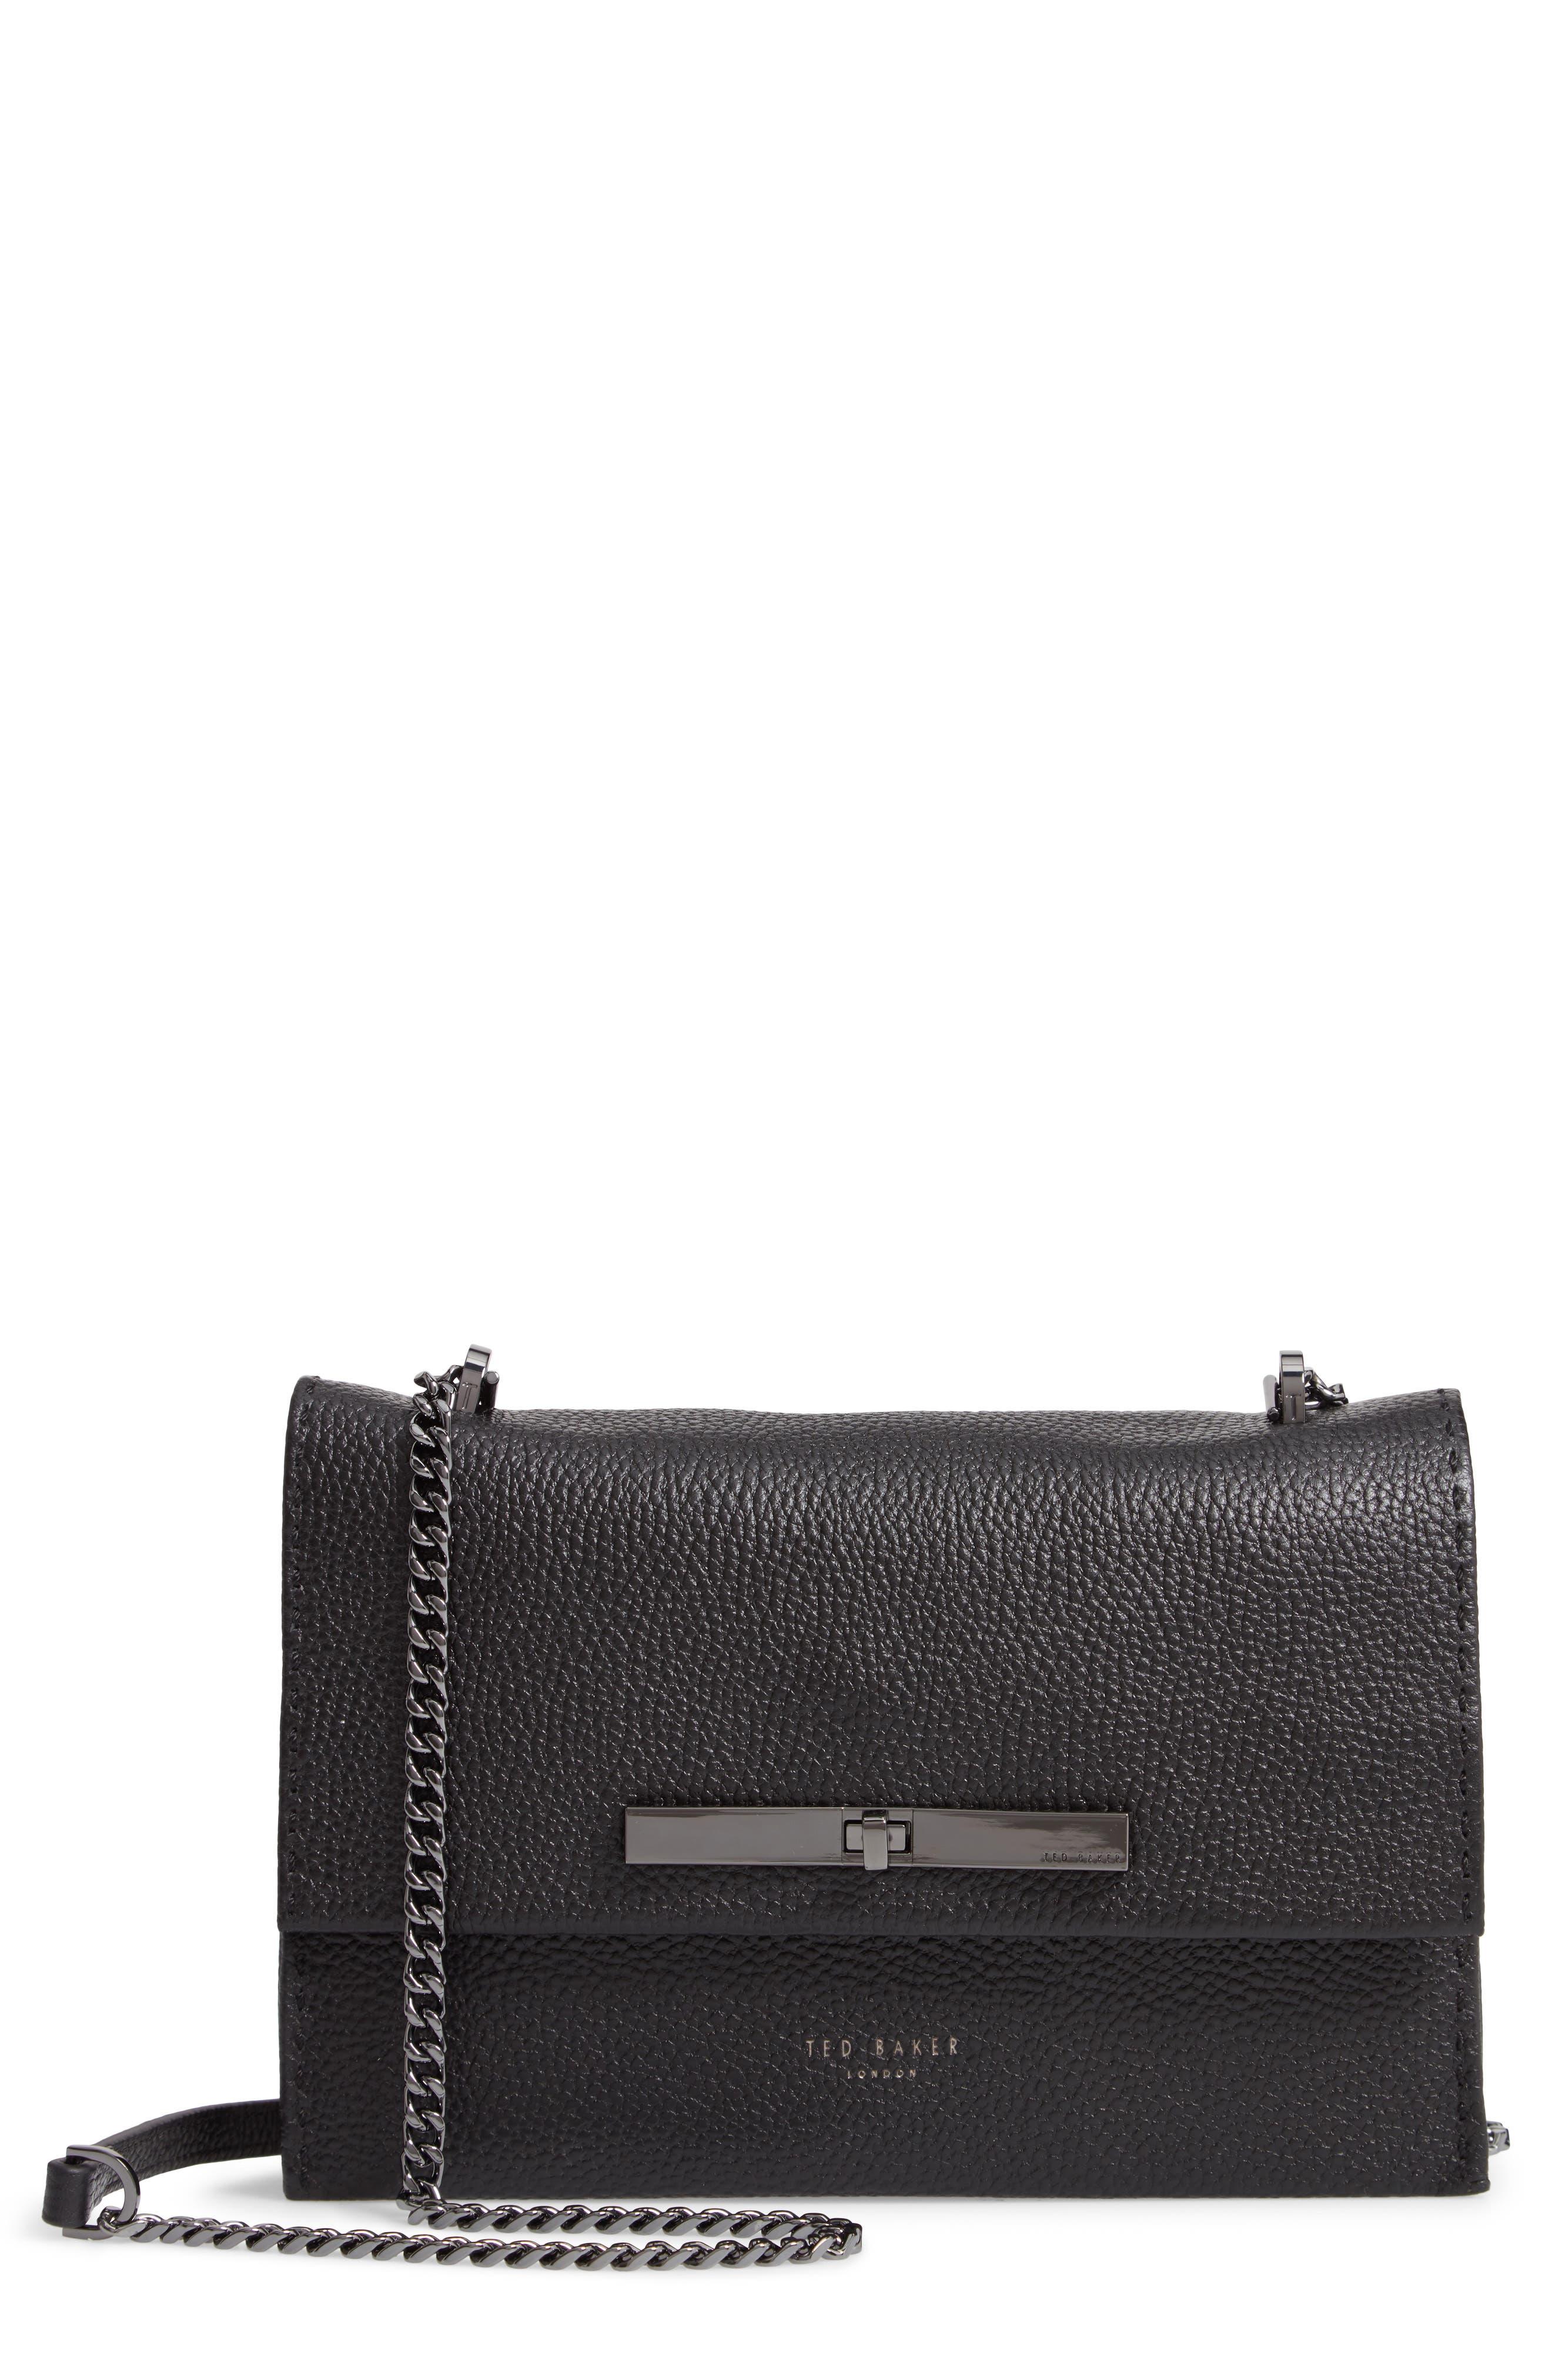 TED BAKER LONDON Jocie Leather Crossbody Bag, Main, color, 001